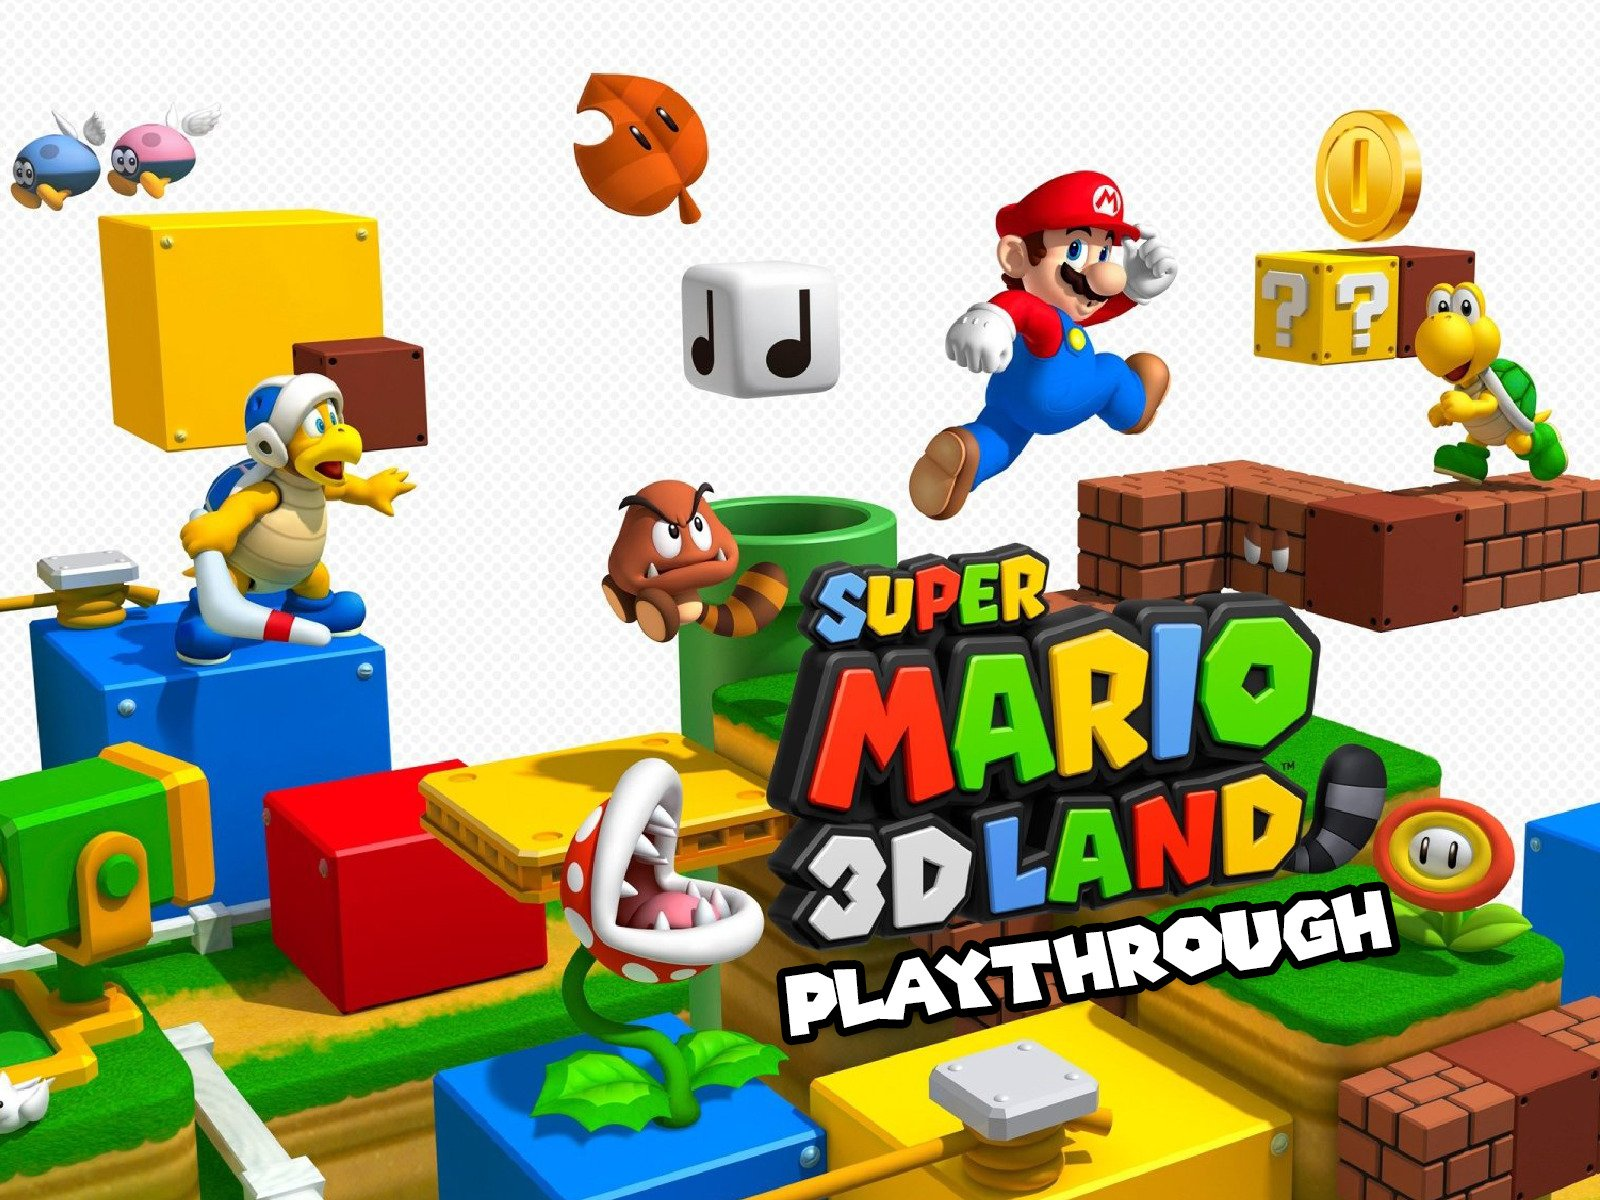 Clip: Super Mario 3D Land Playthrough